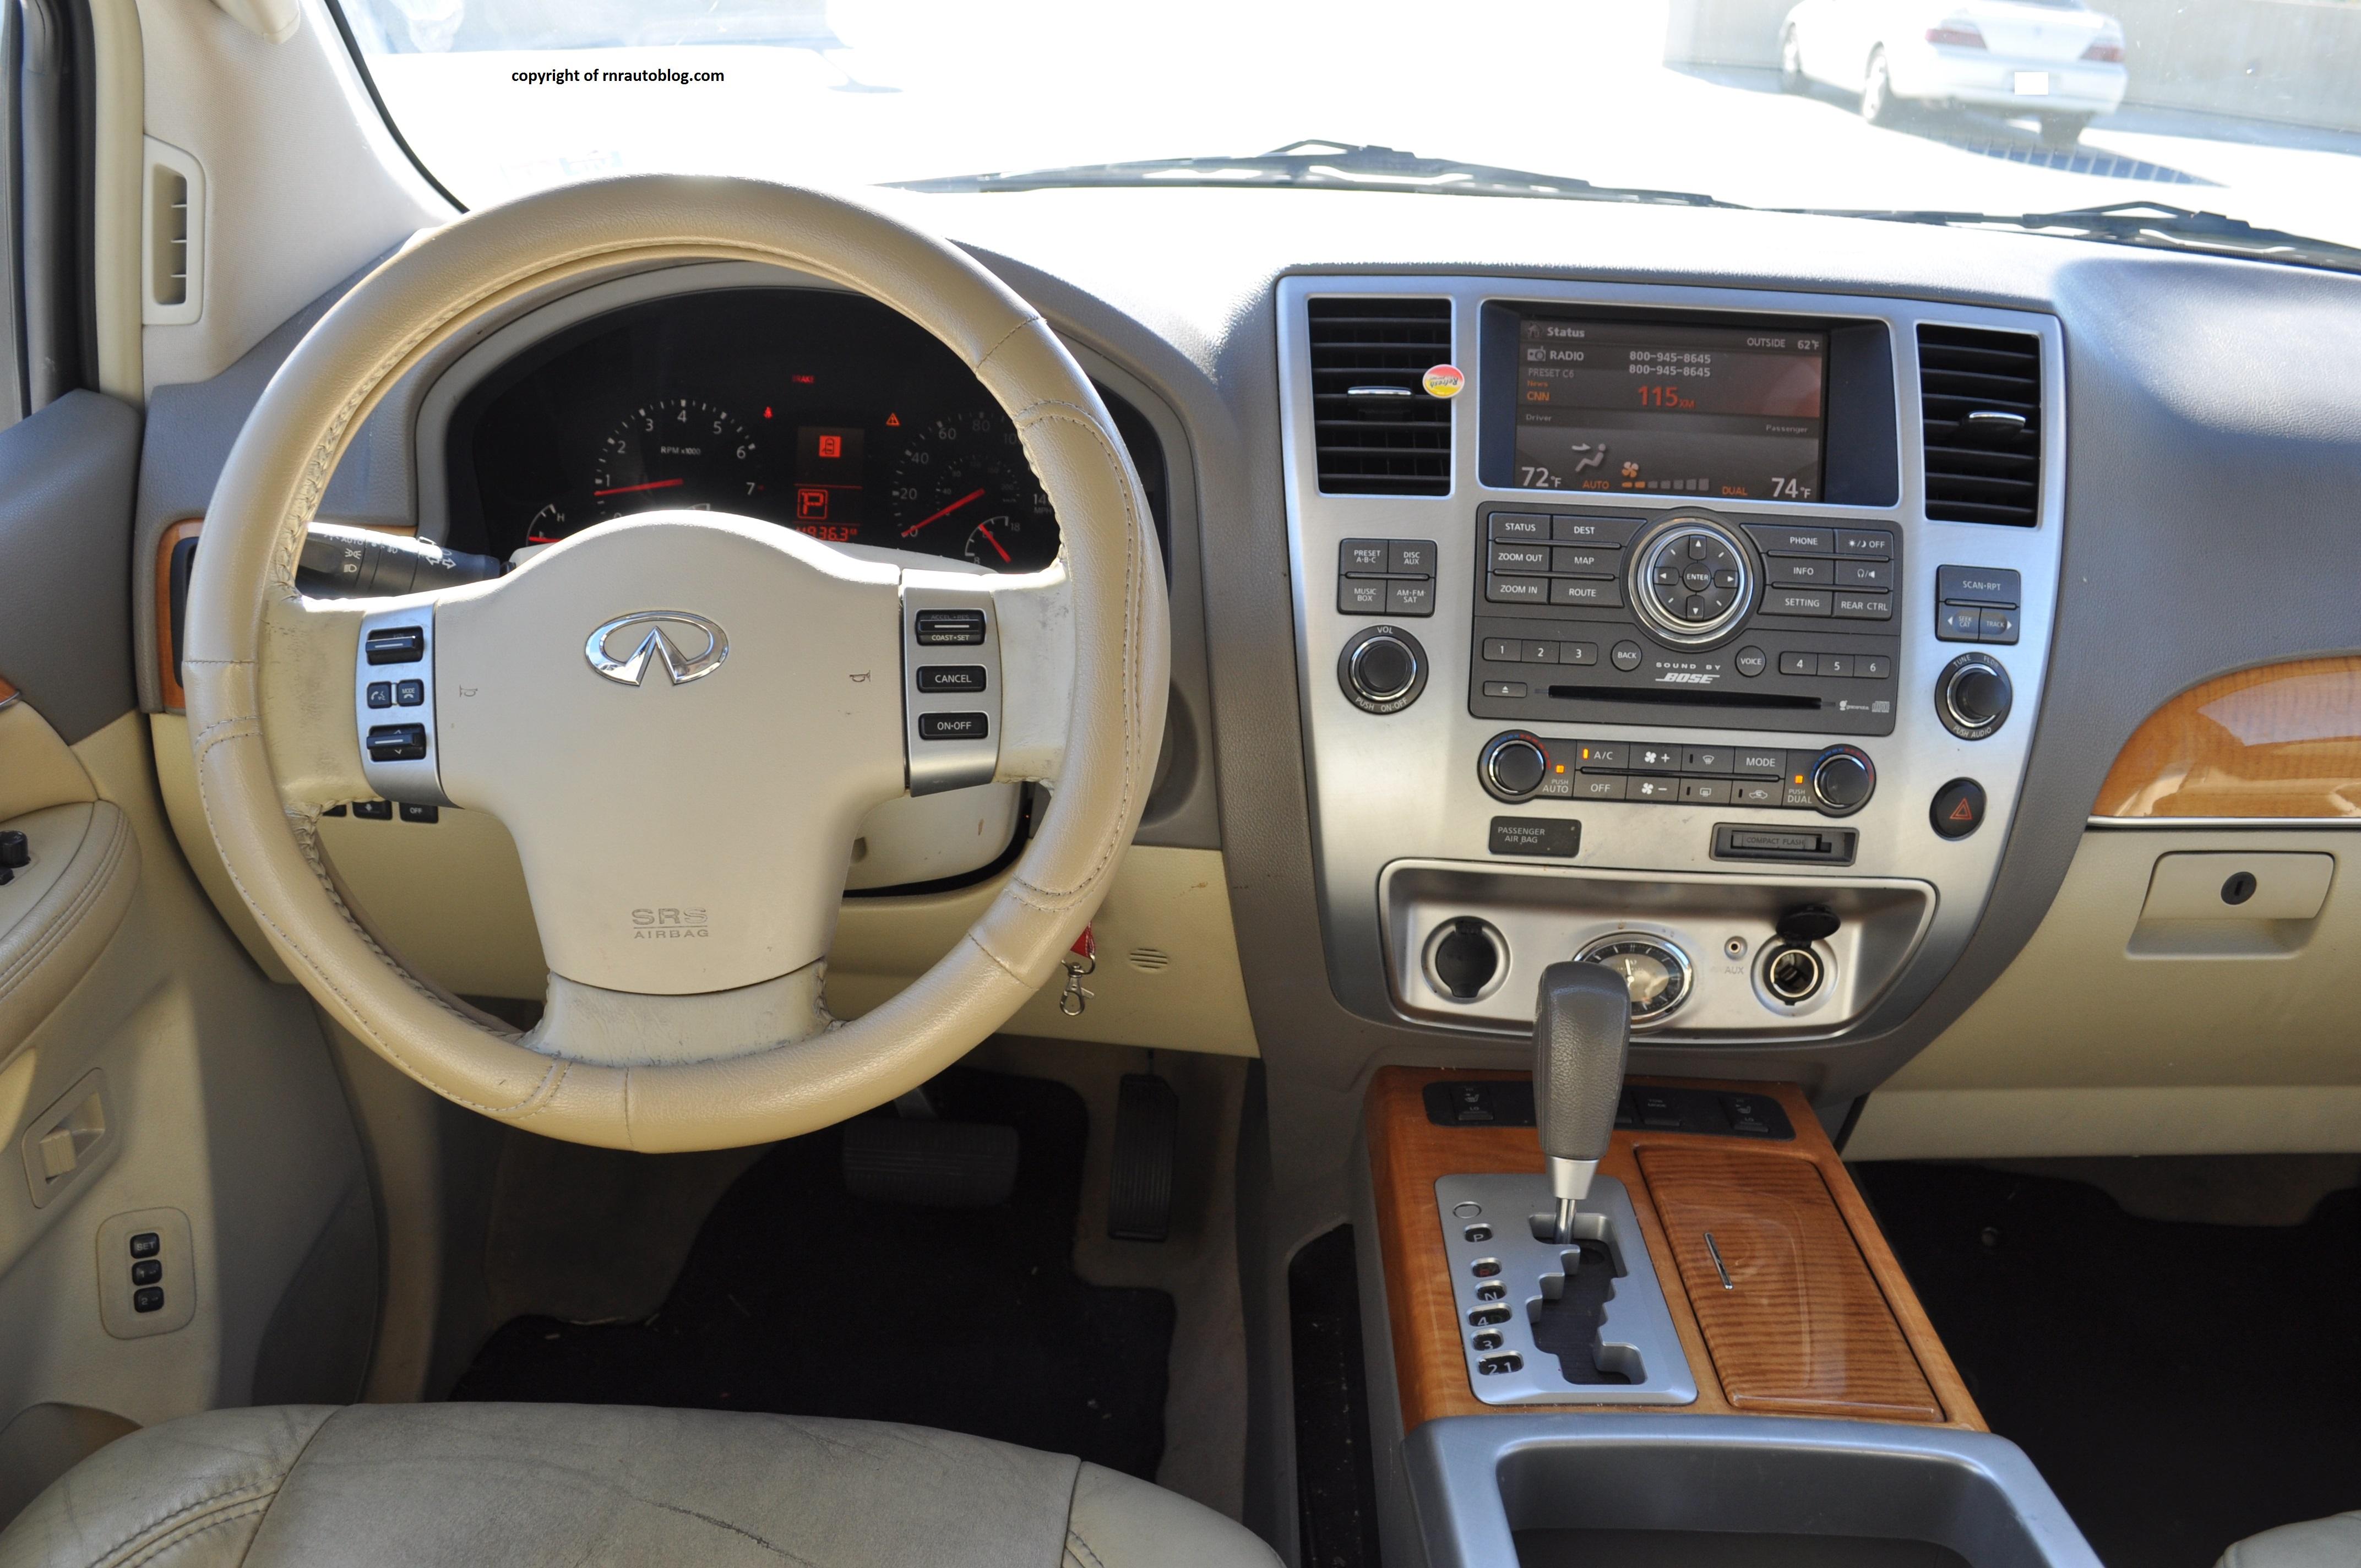 infiniti g35 interior 2008. qx5610 infiniti g35 interior 2008